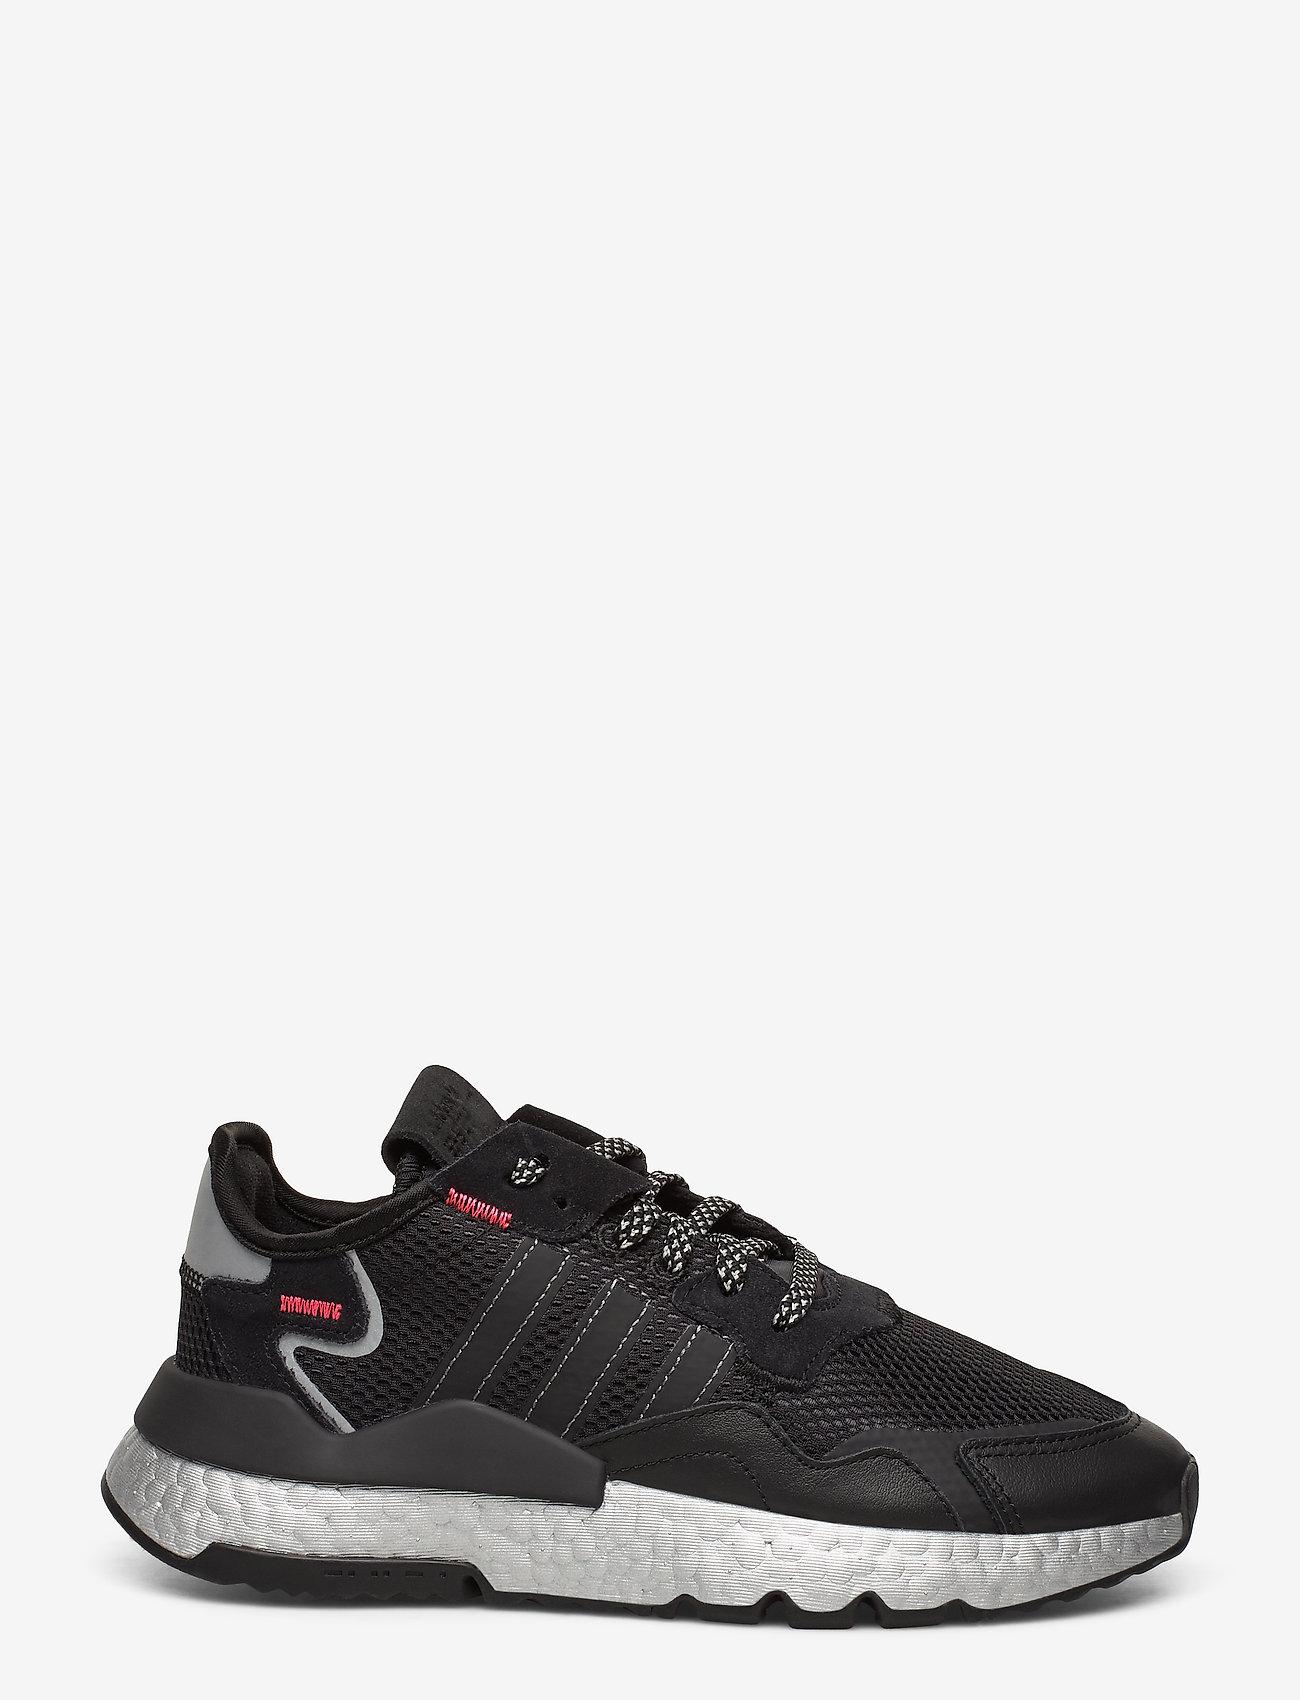 adidas Originals - NITE JOGGER W - chunky sneaker - cblack/shored/silvmt - 1